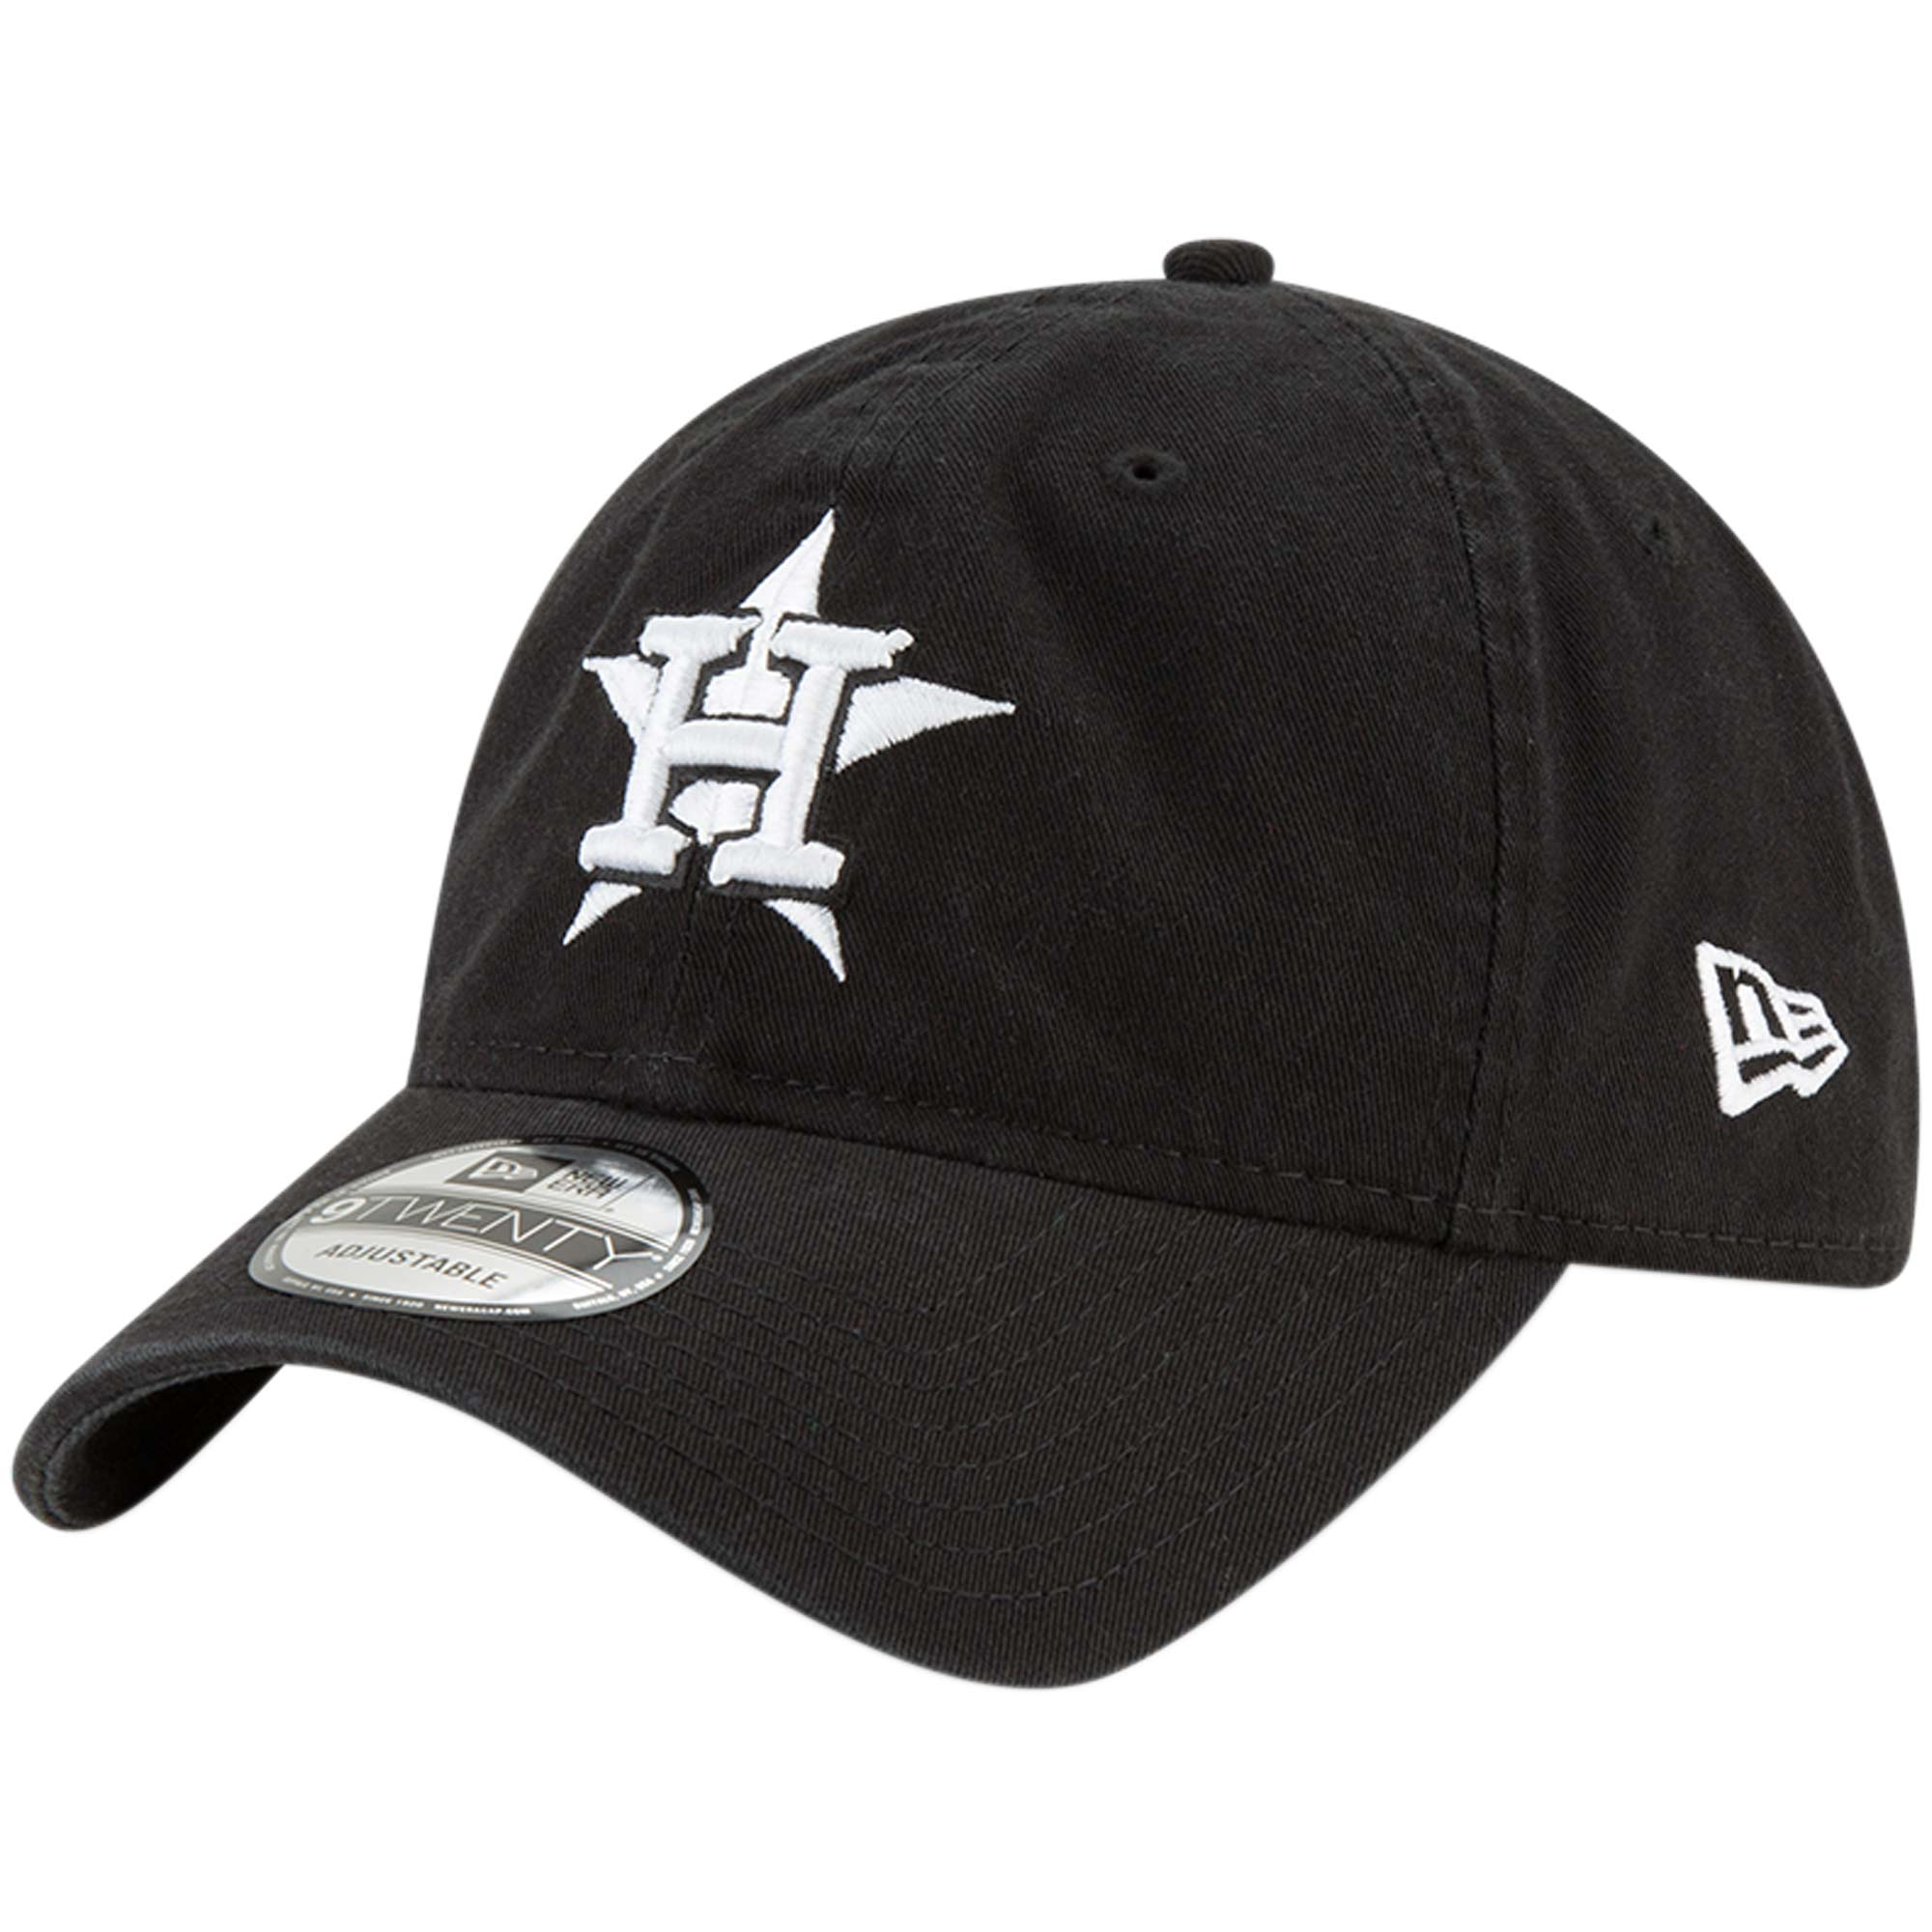 Houston Astros New Era Core Classic Twill 9TWENTY Adjustable Hat - Black